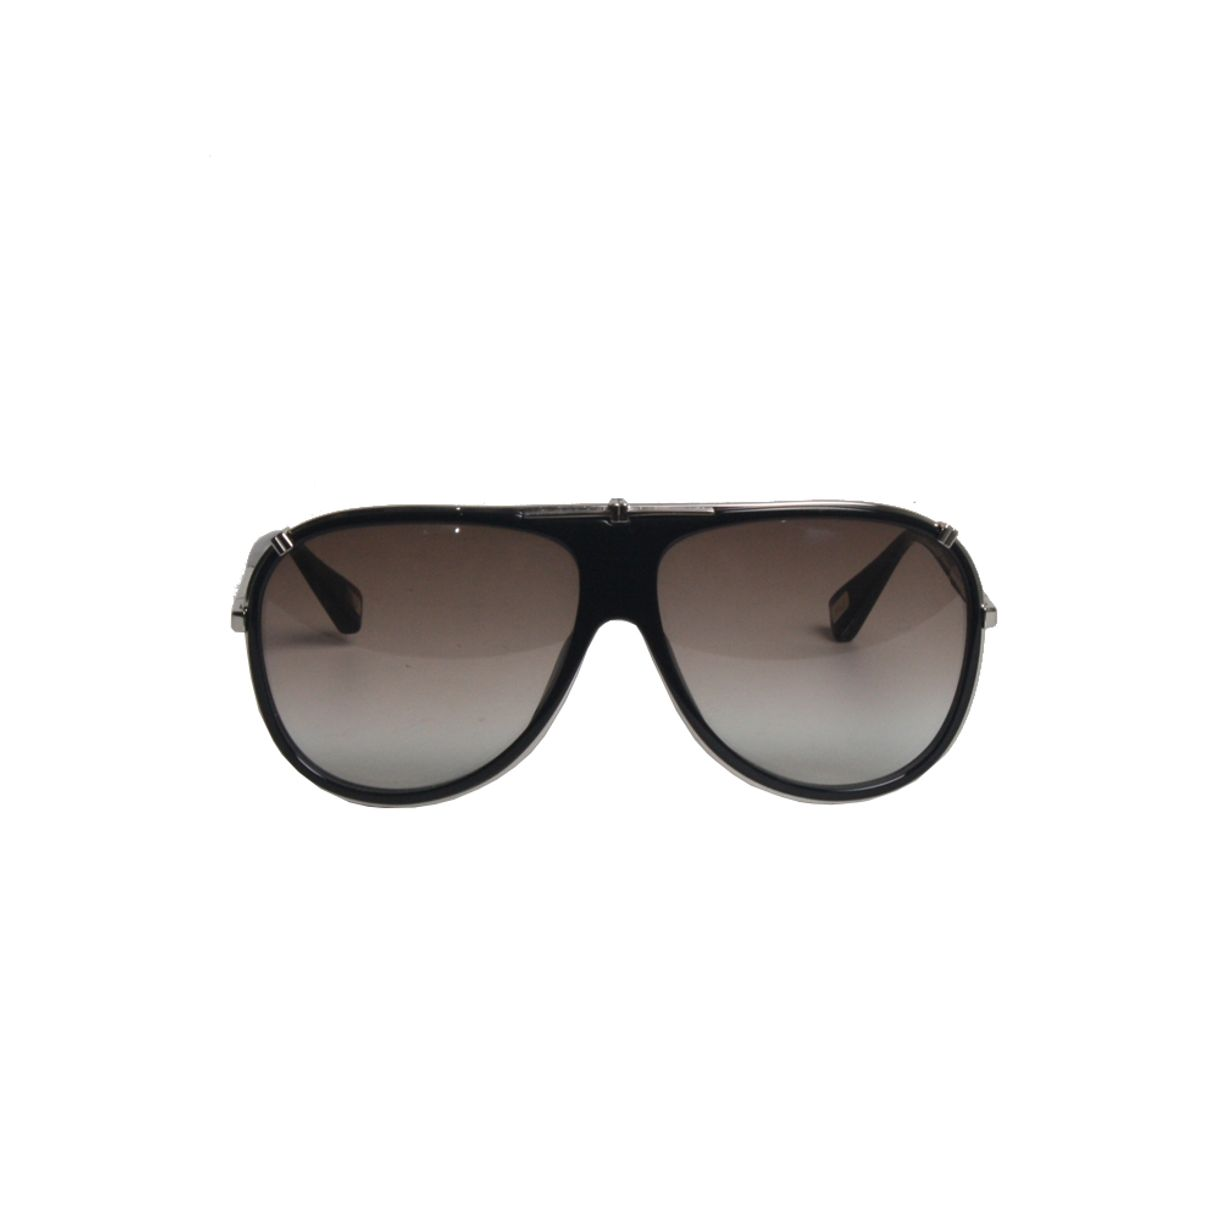 Oculos-Marc-Jacobs-Preto-Metal-Acetato